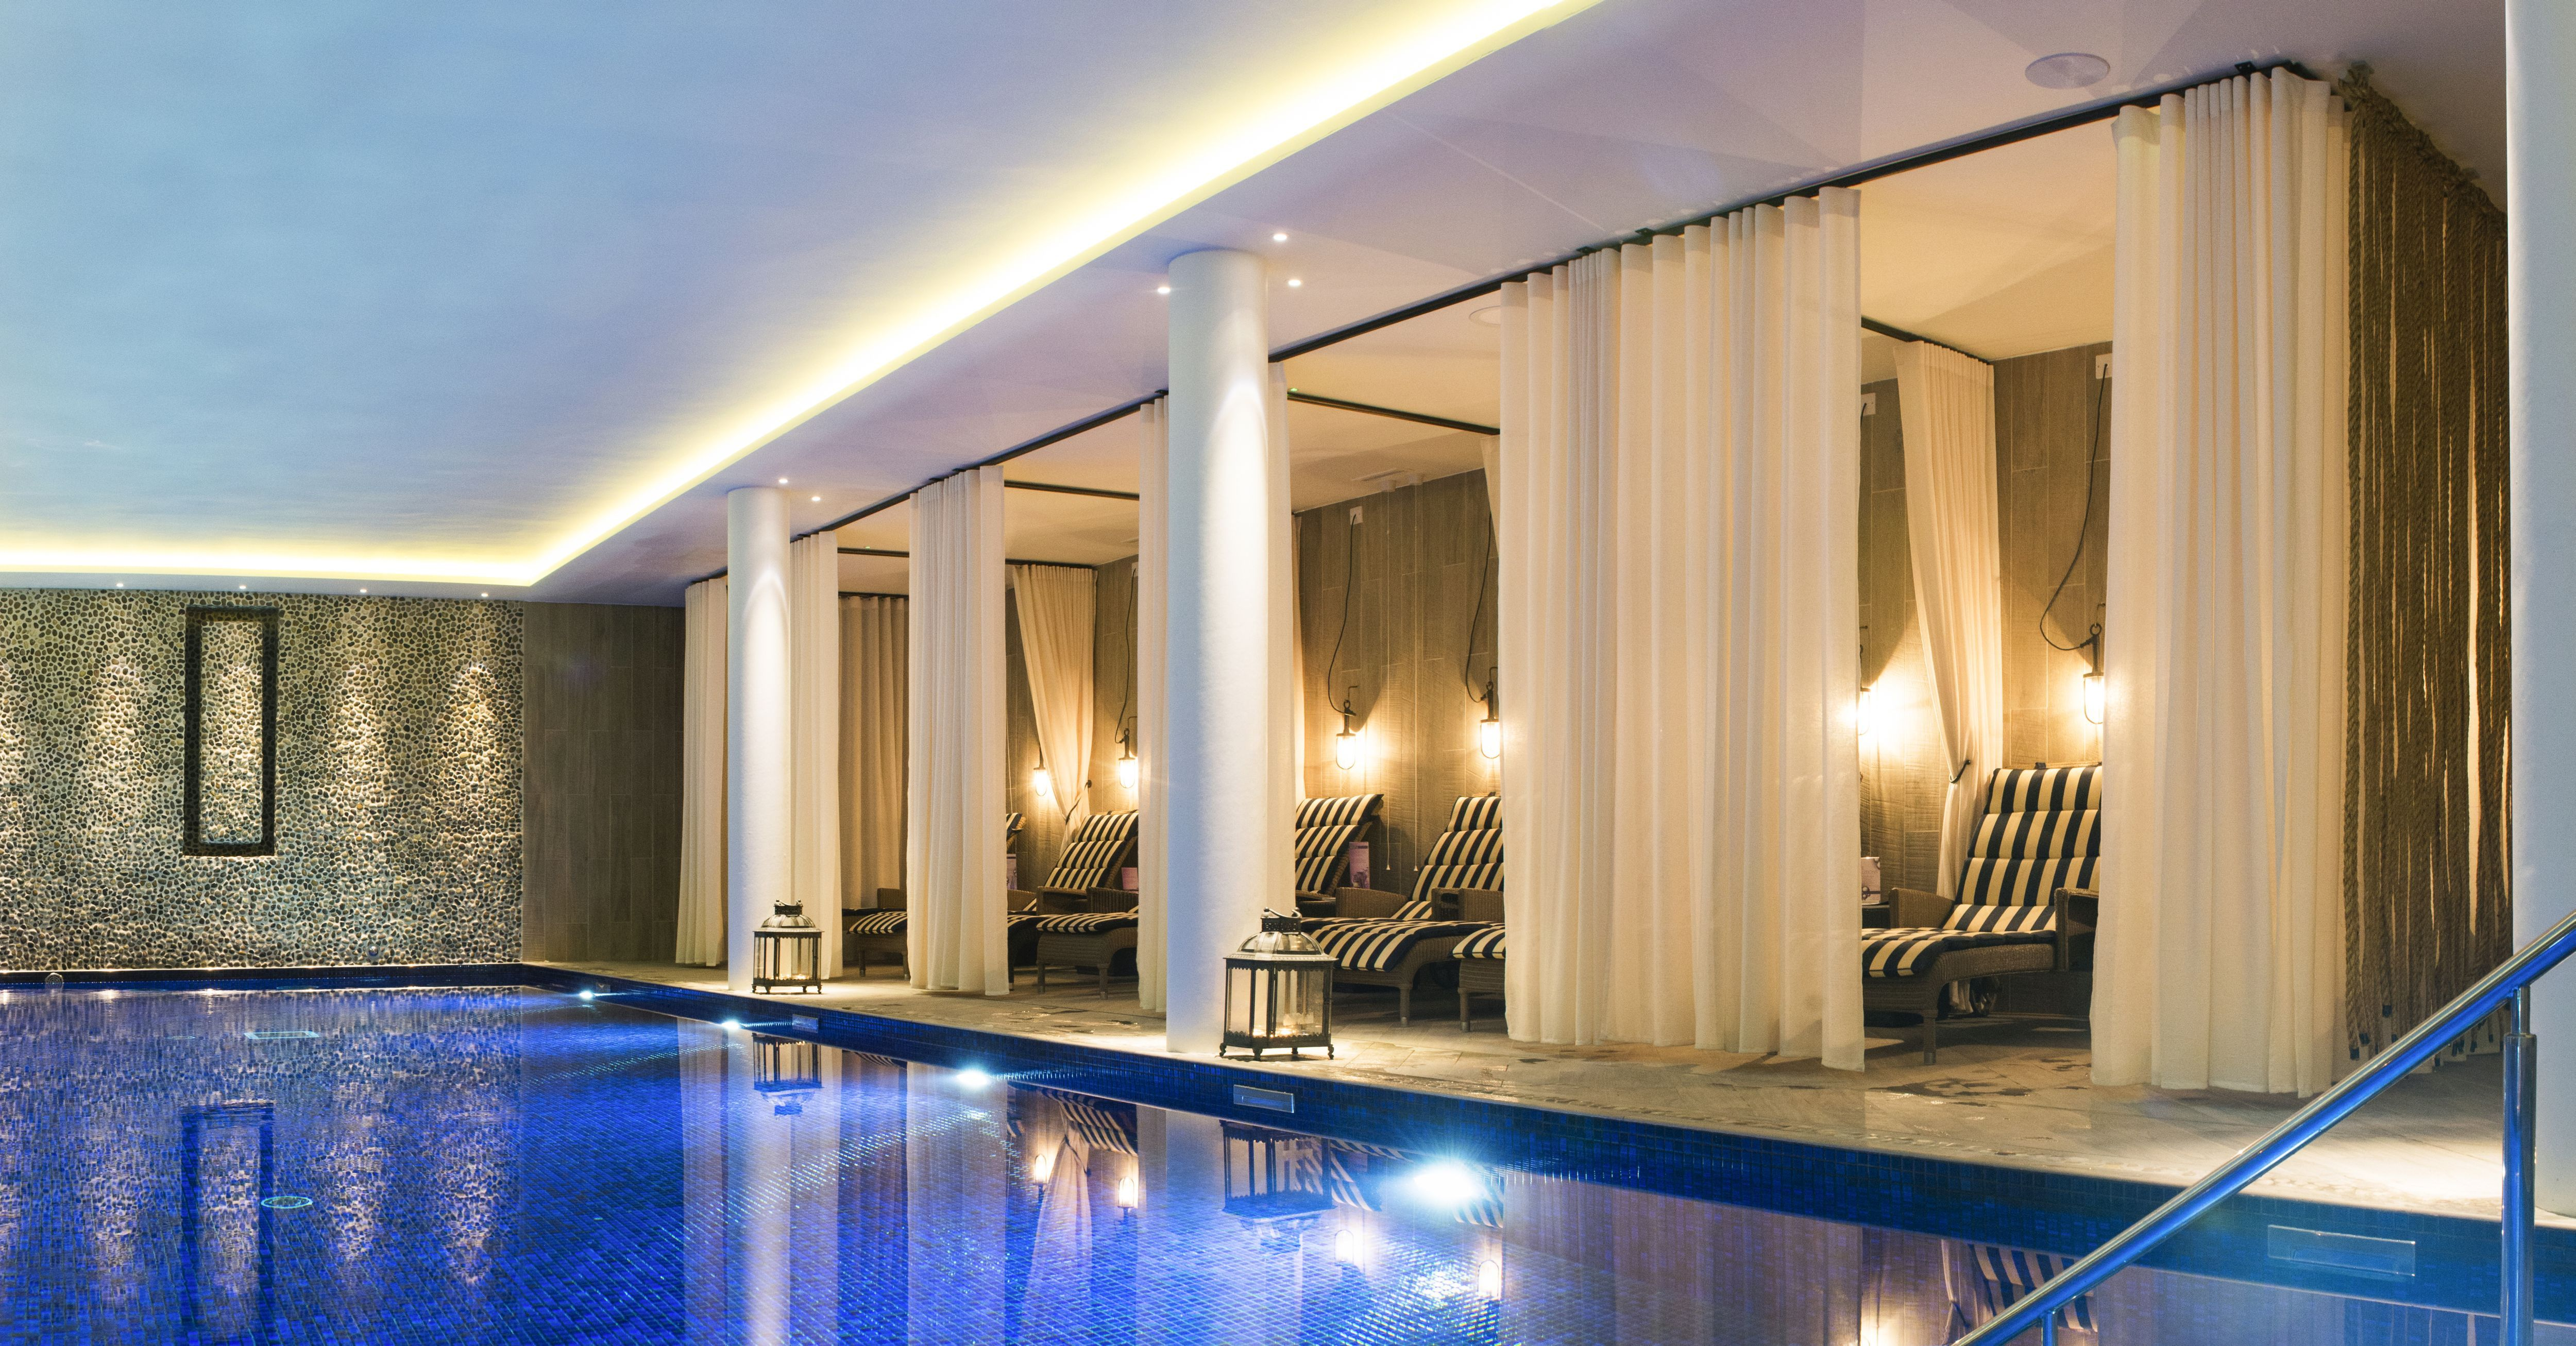 Hotel Spa Luxury Spa Hotels Hotel